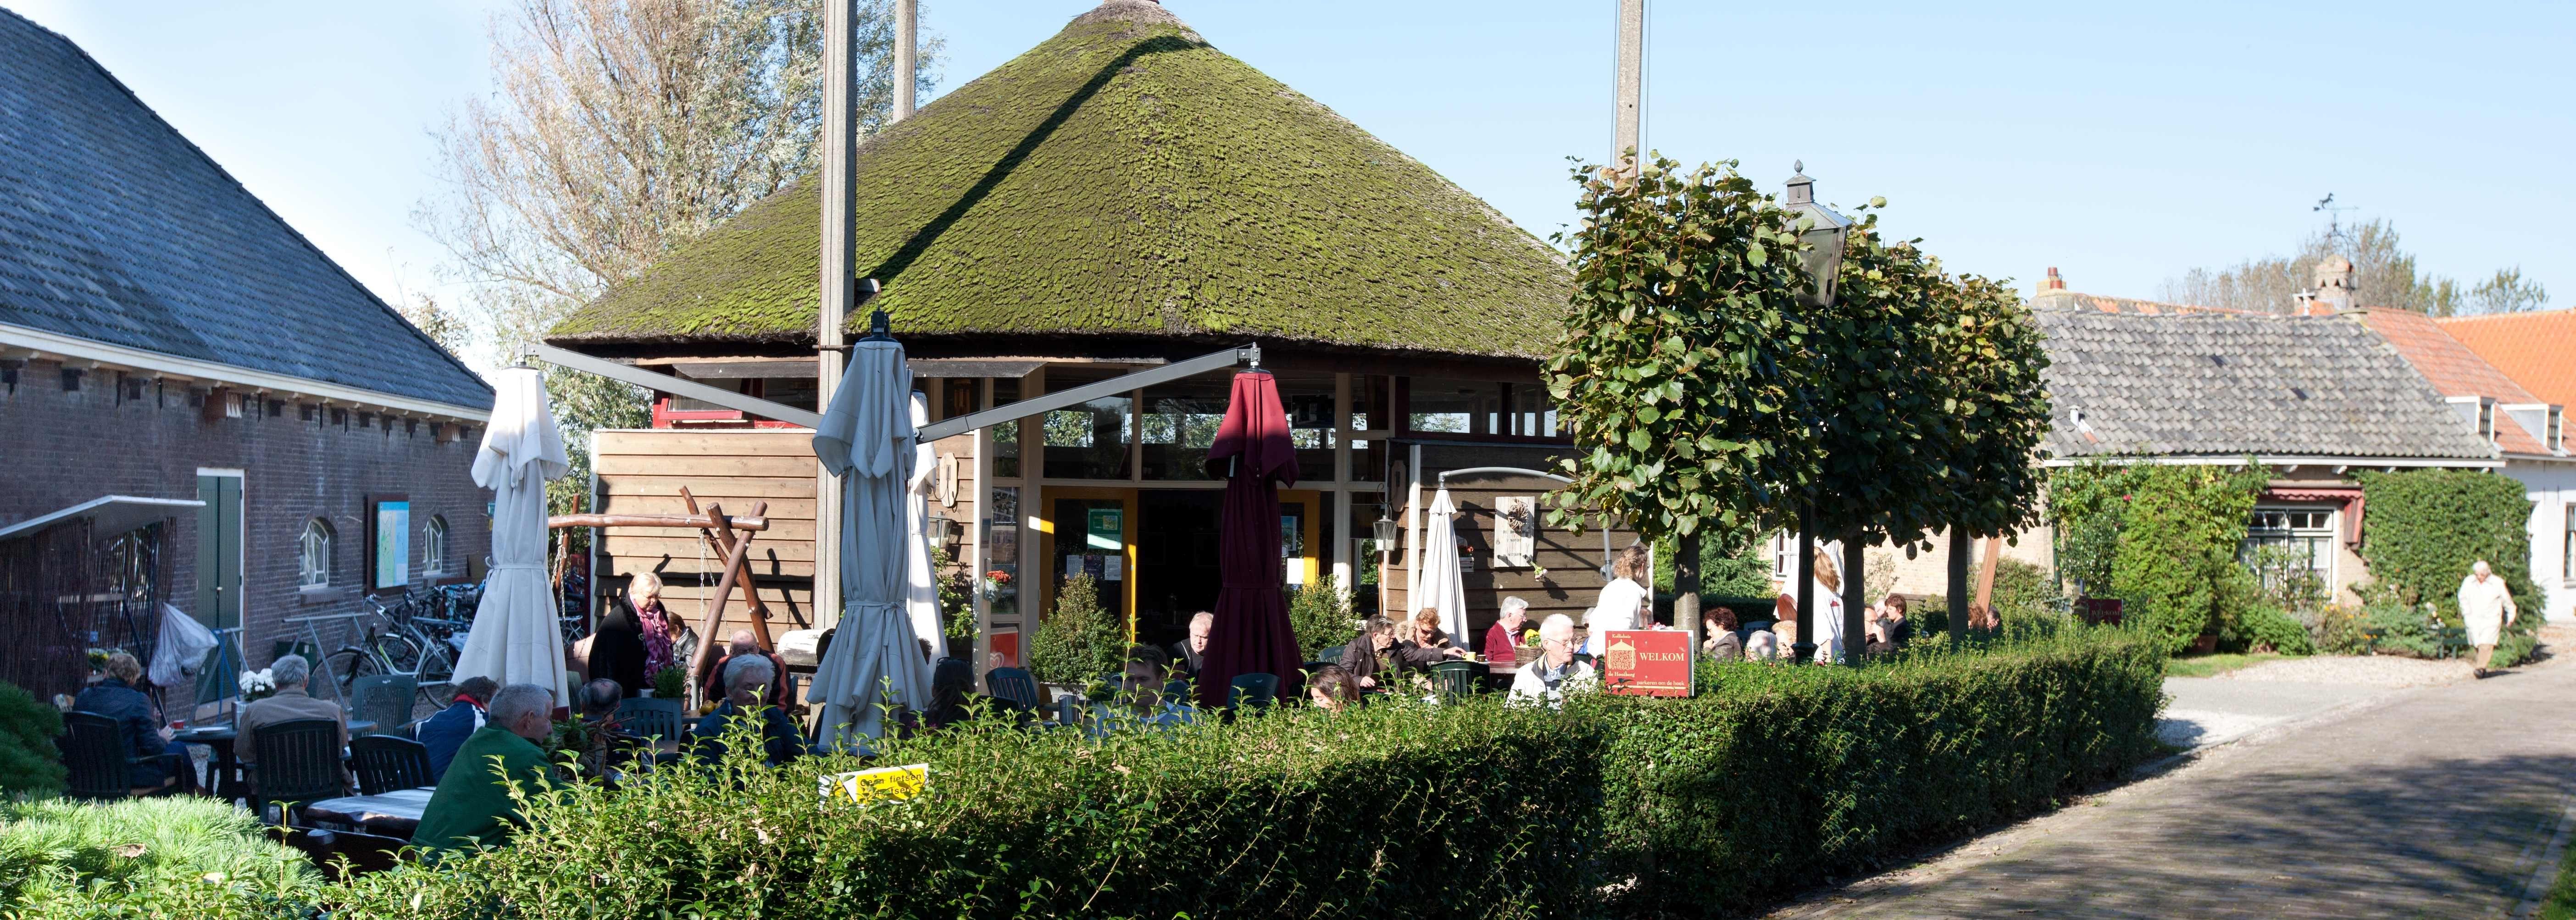 Koffiehuis De Hooiberg